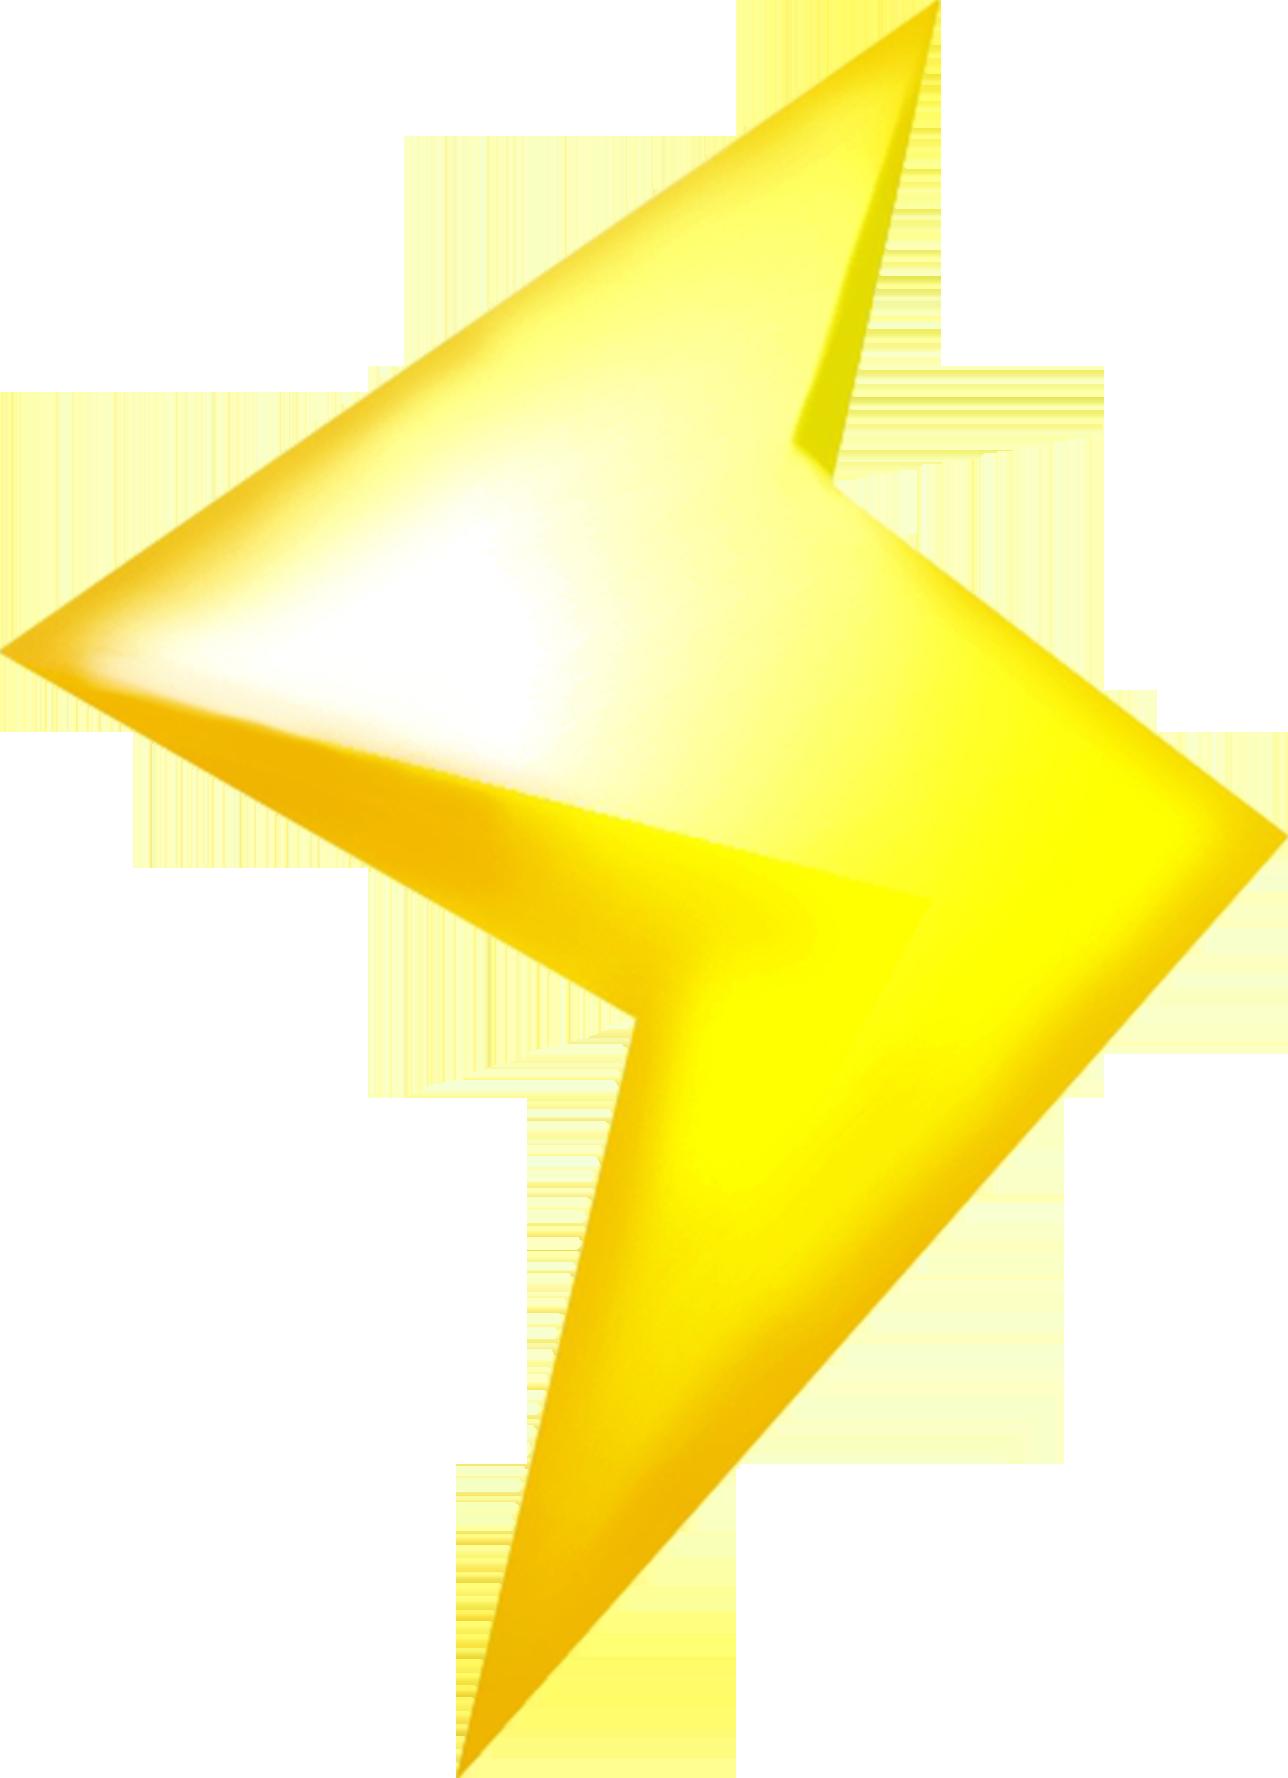 Glowless Lightning Bolt - Mario Kart Wii.png